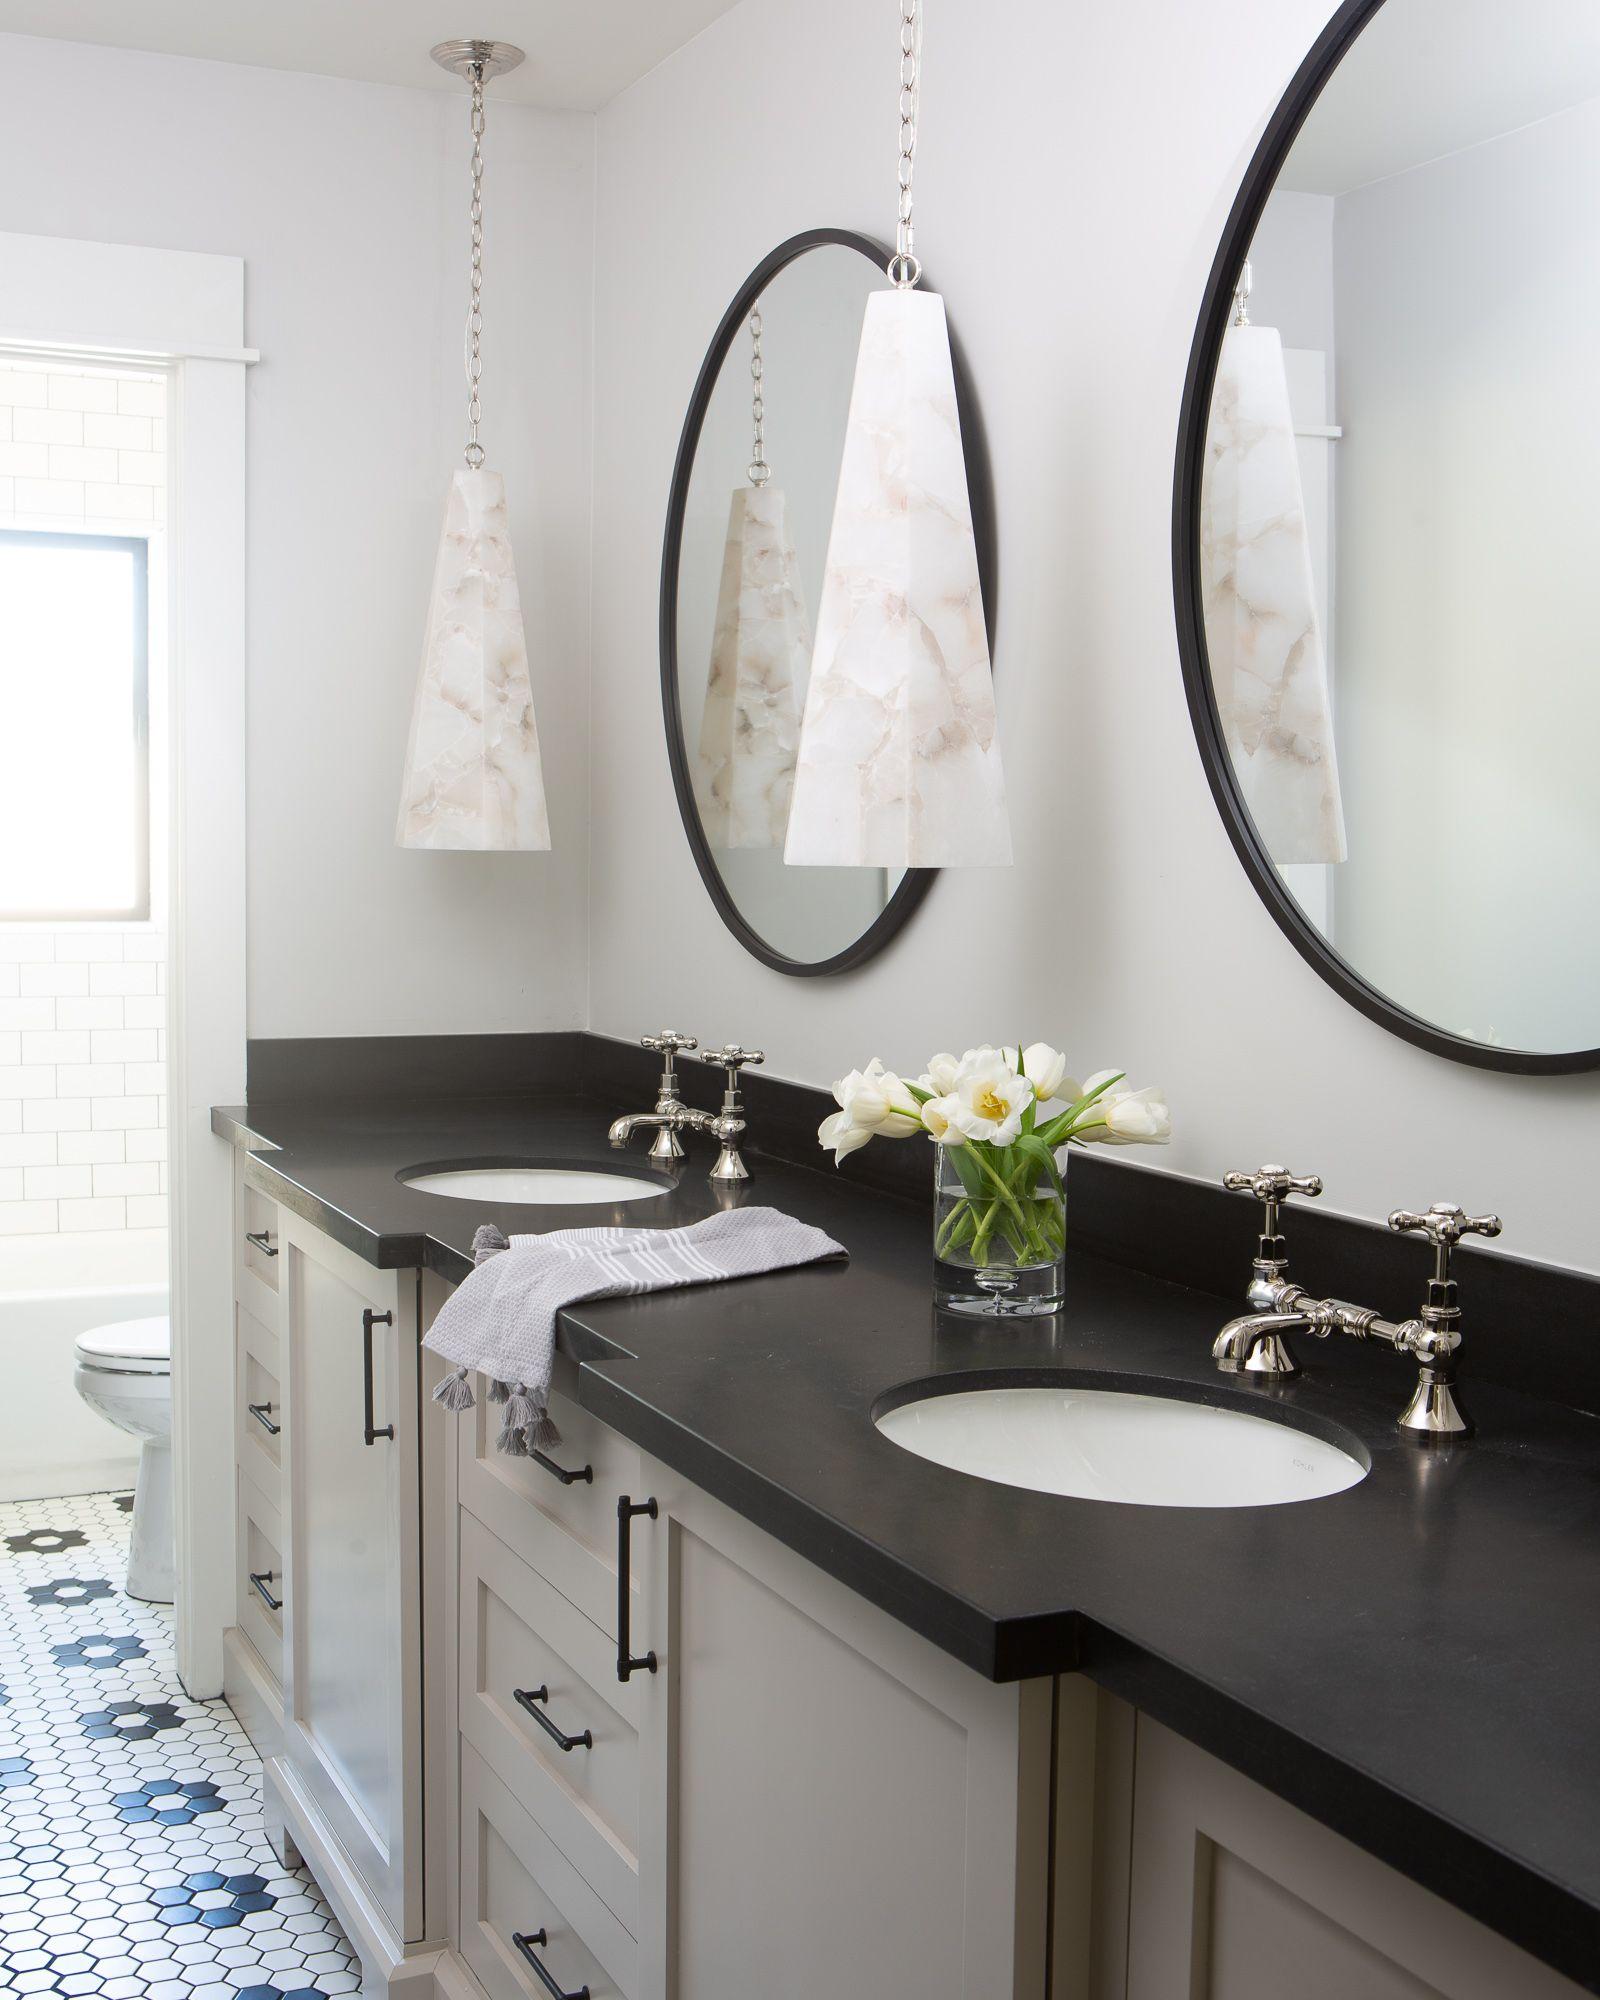 Pin By Prima Hayter On Bathrooms Black Bathroom Oval Mirror